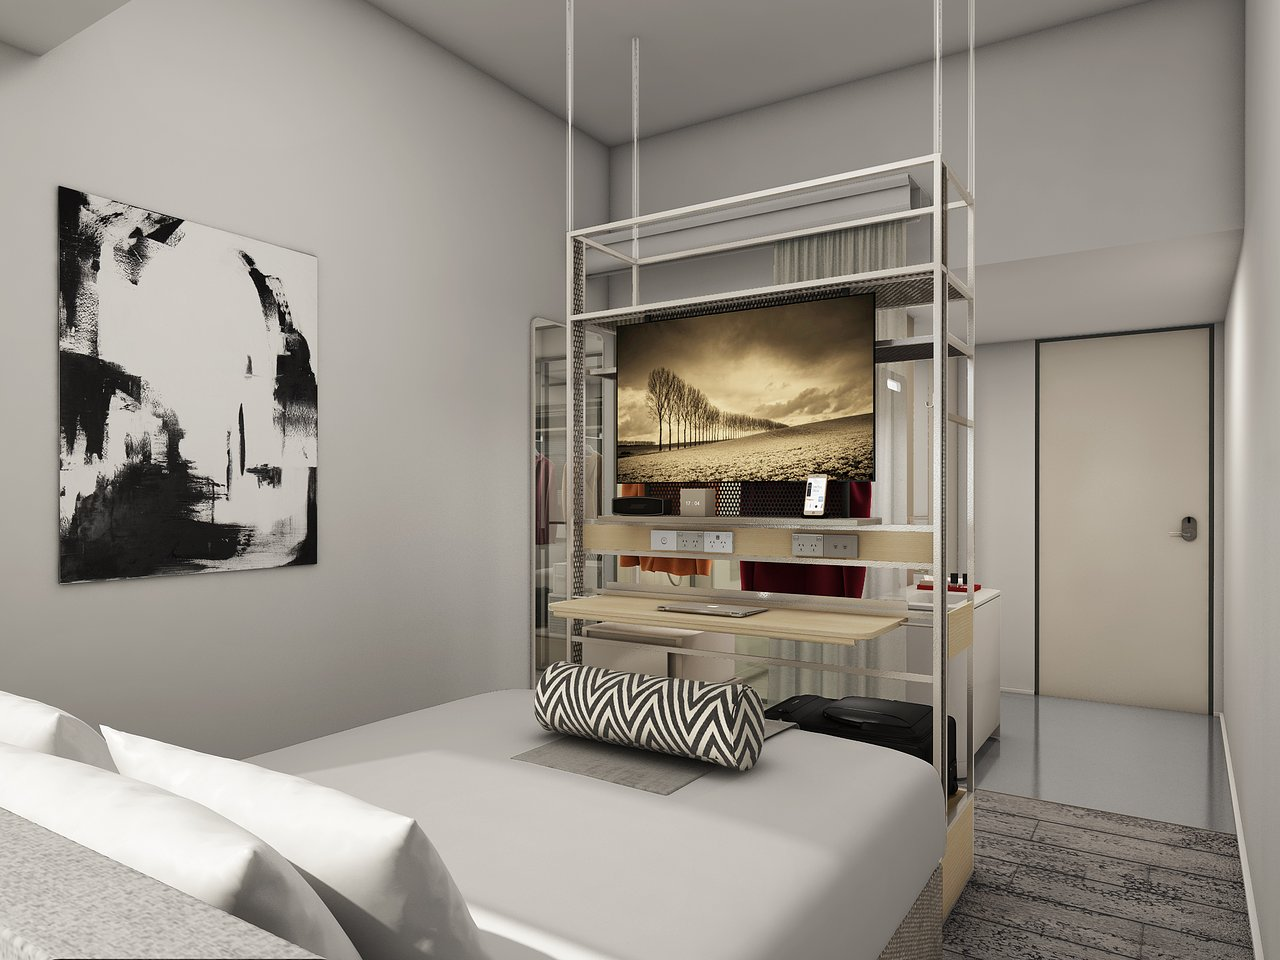 kafnu alexandria prices hotel reviews sydney australia rh tripadvisor com